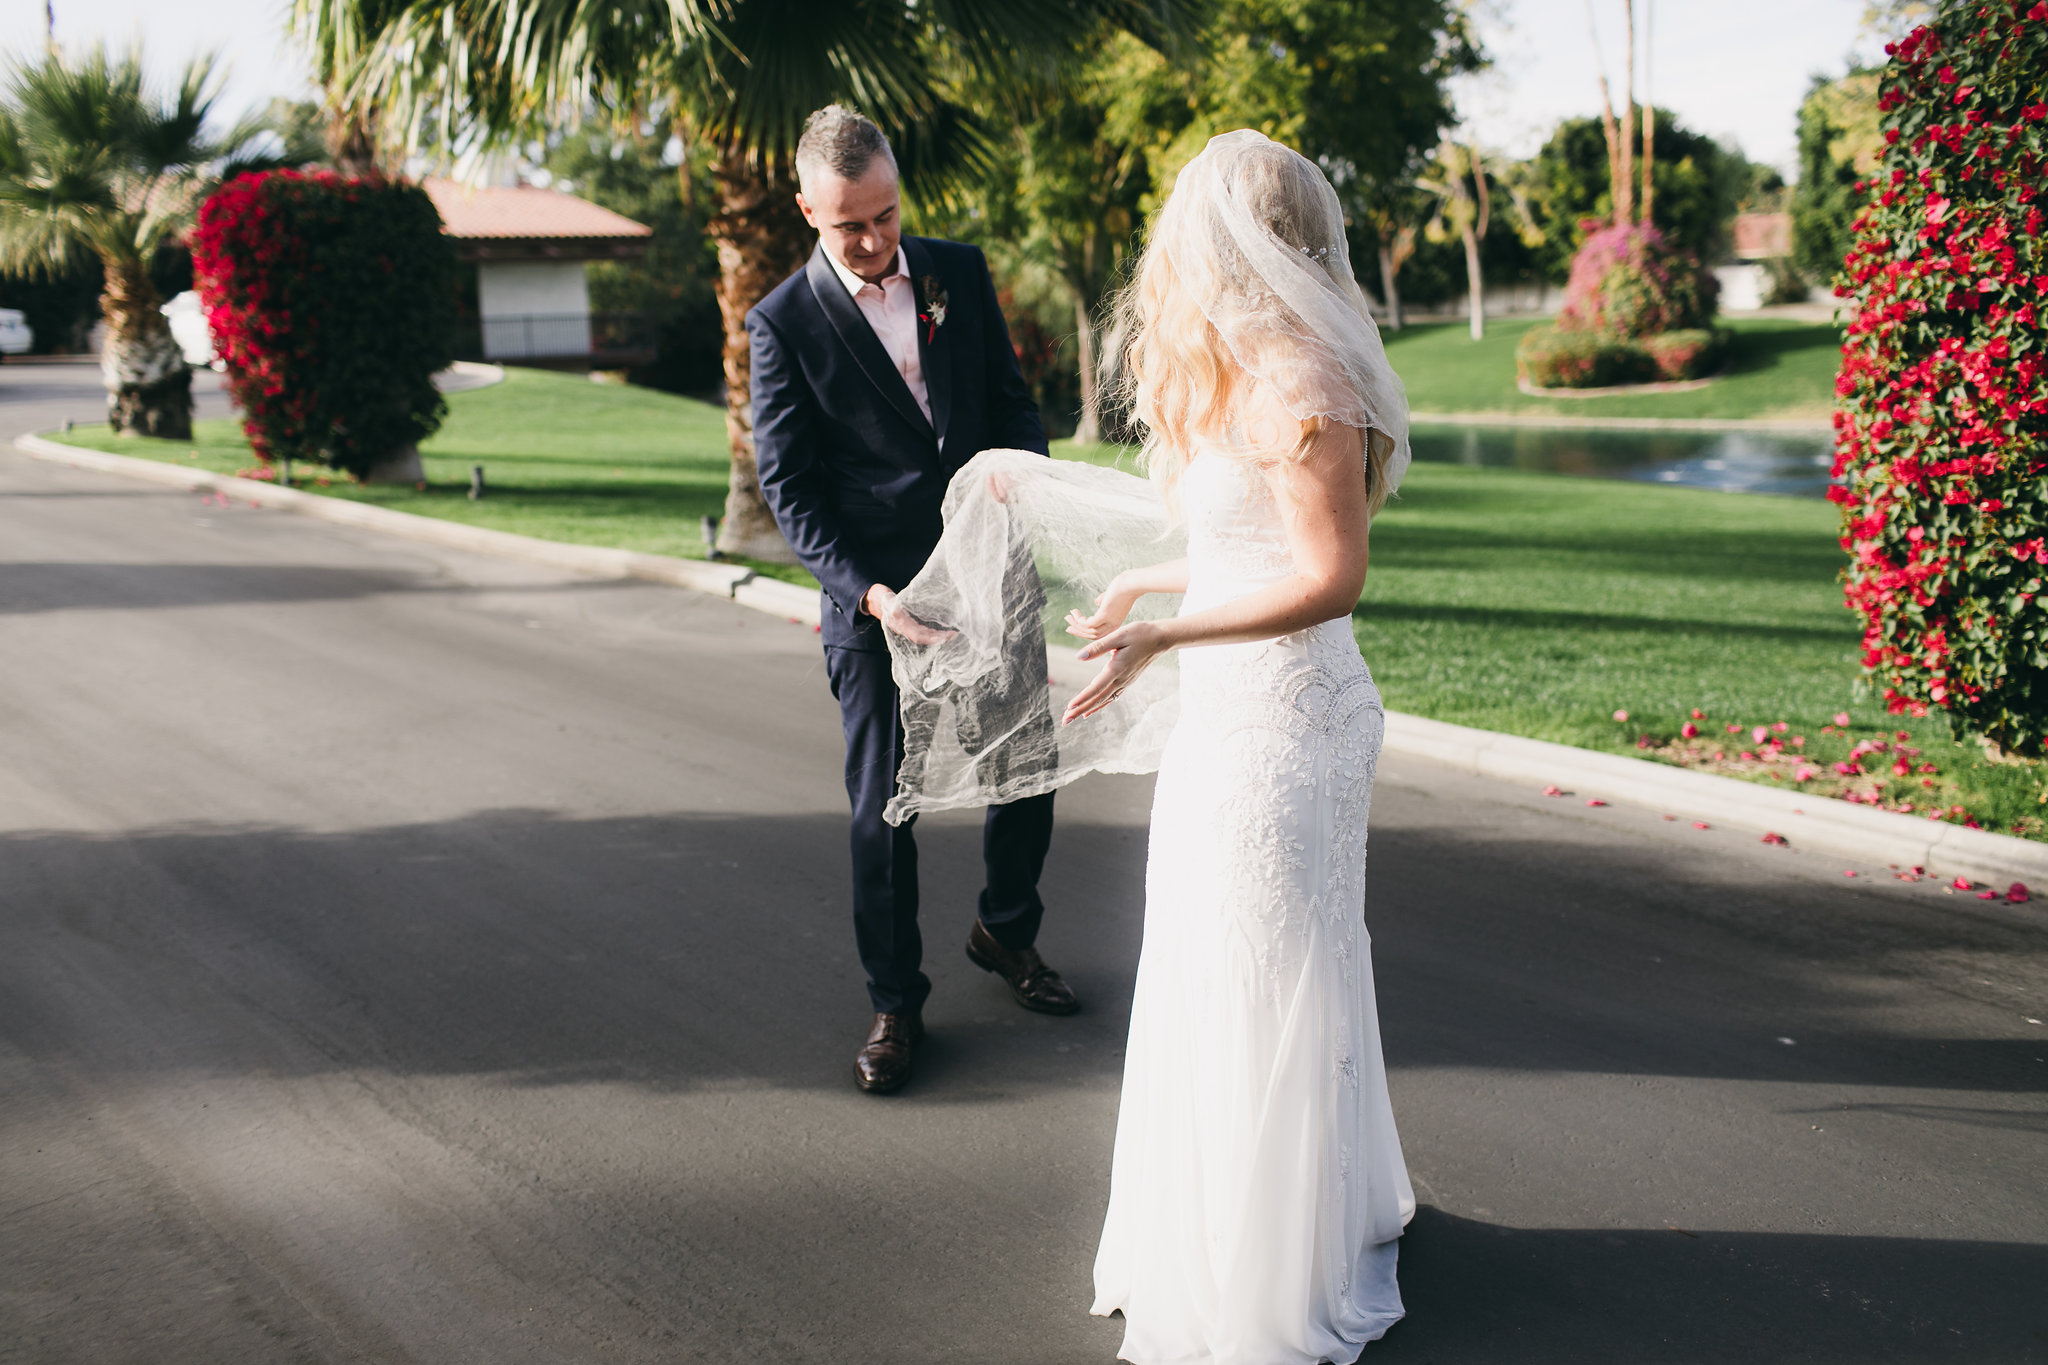 Gracy-Andrew-Wedding-169.jpg